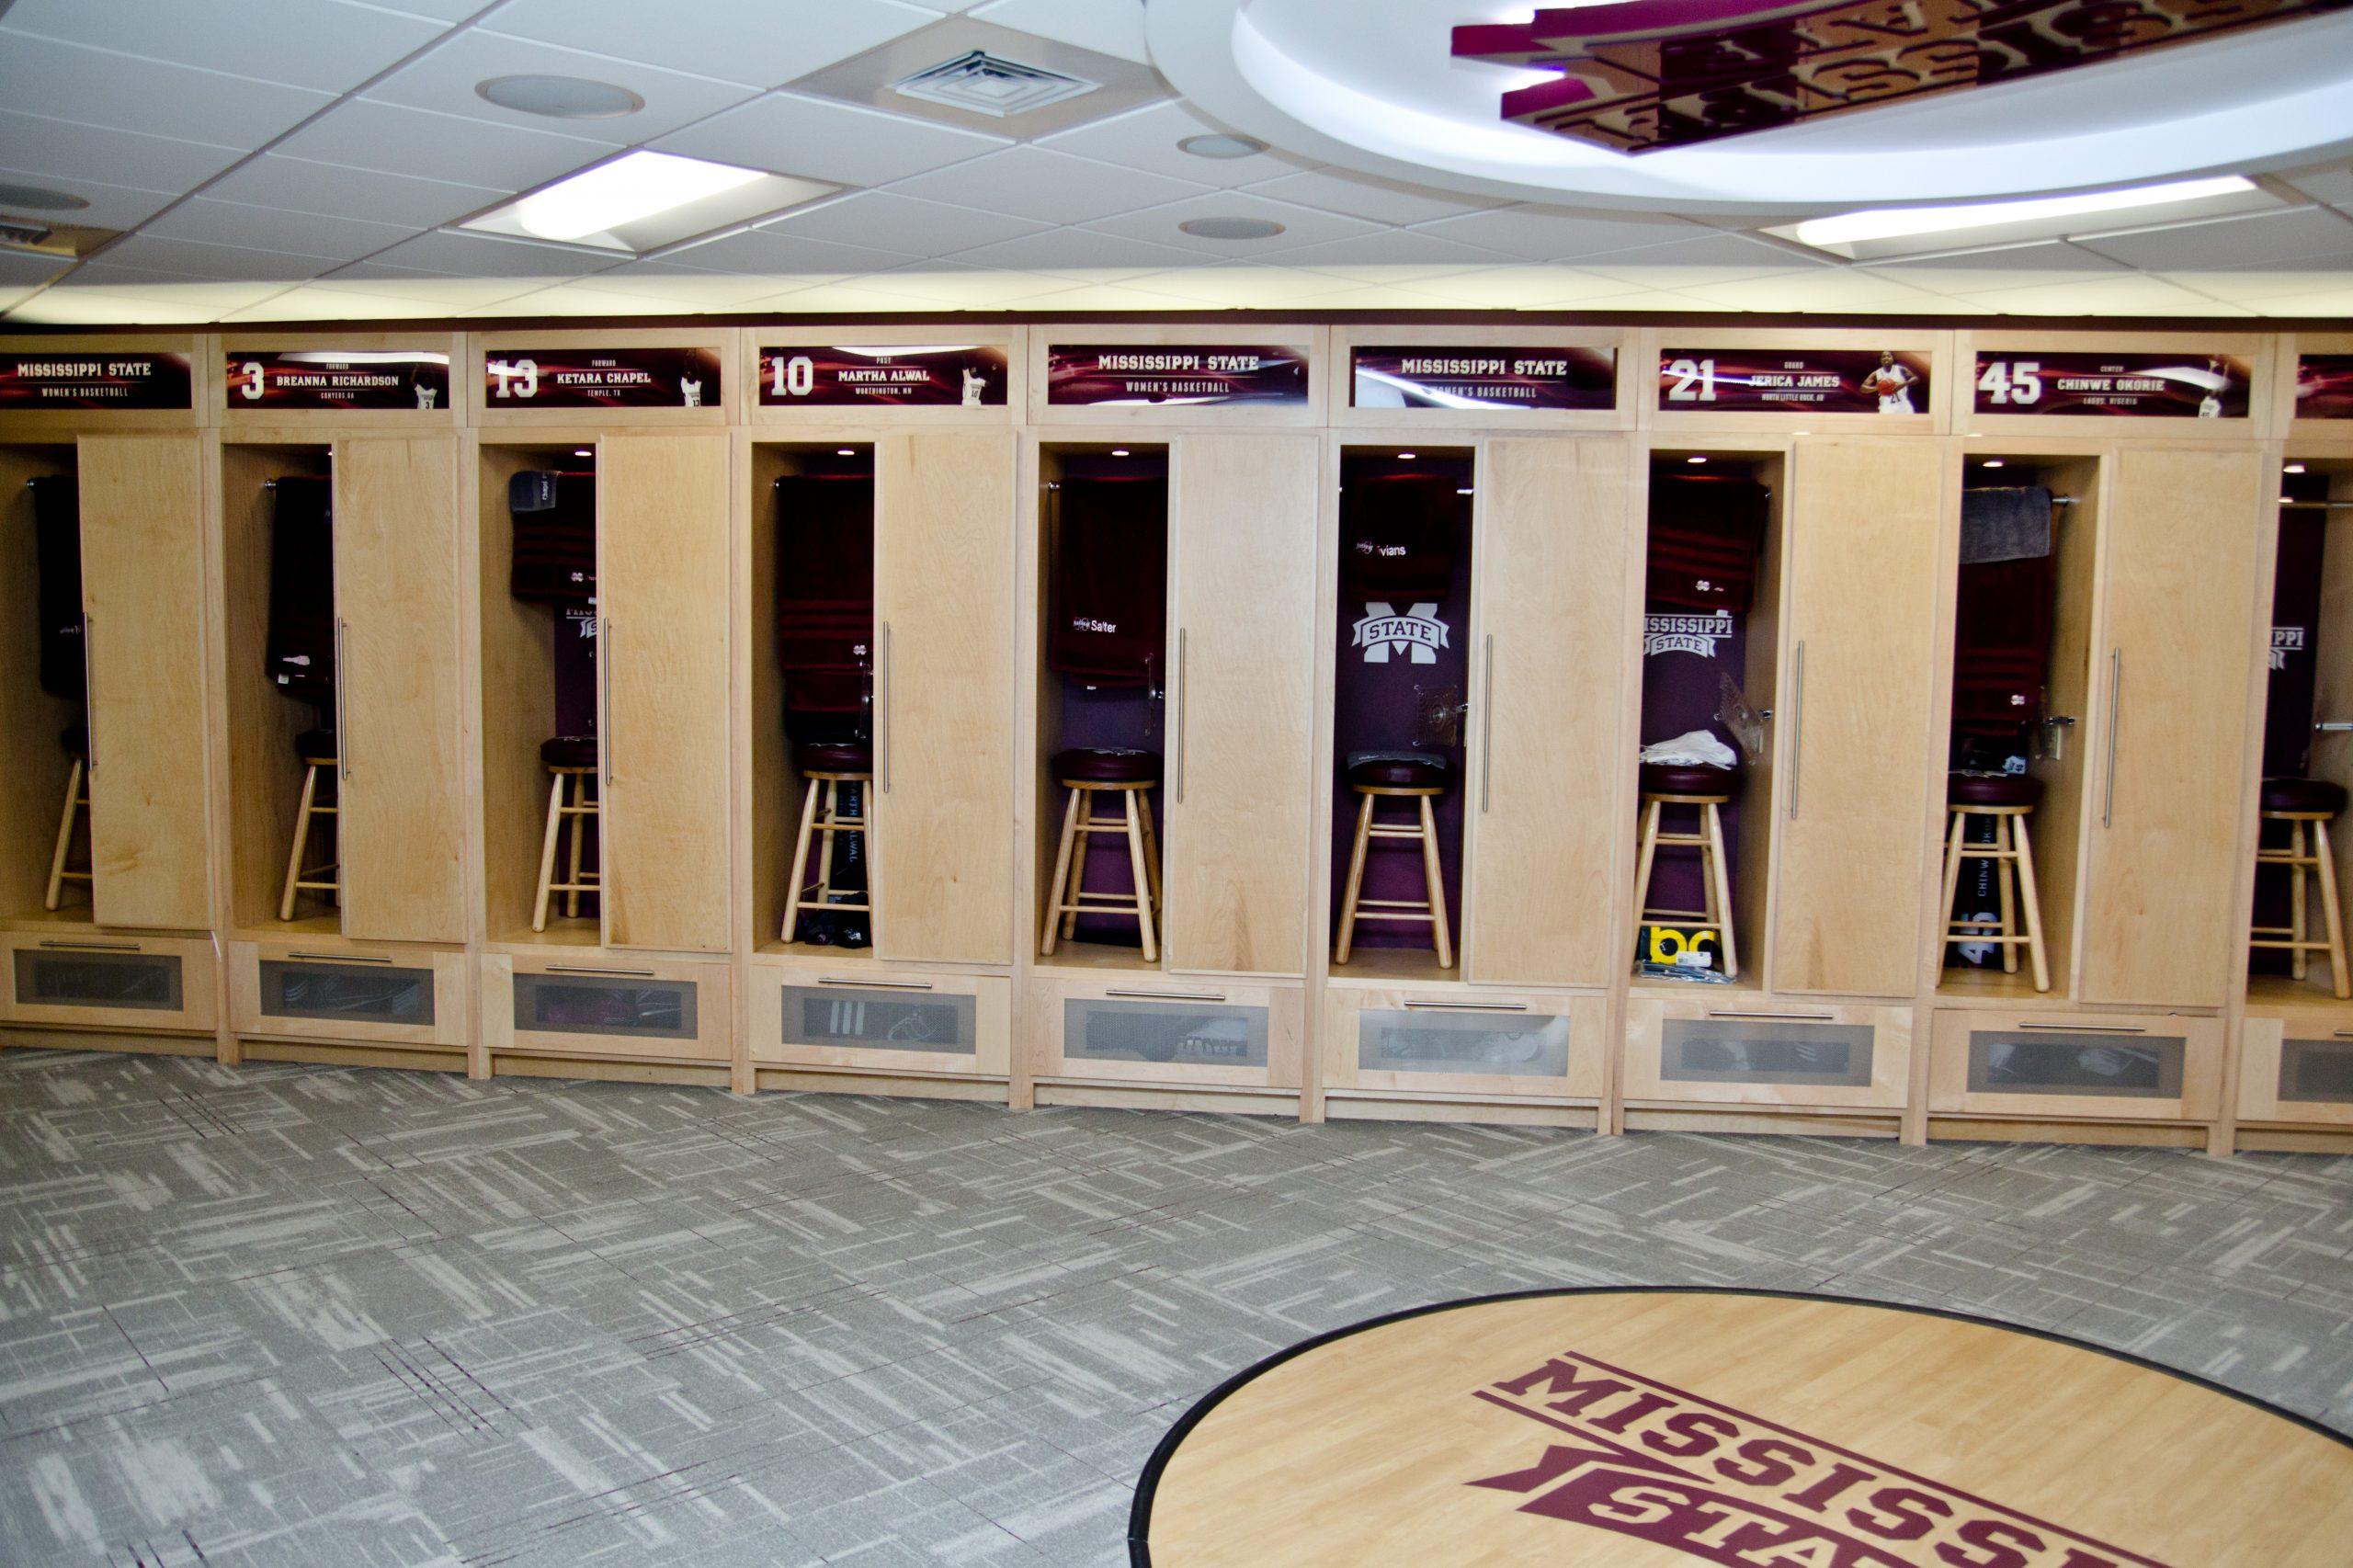 MSU Basketball Locker Rooms